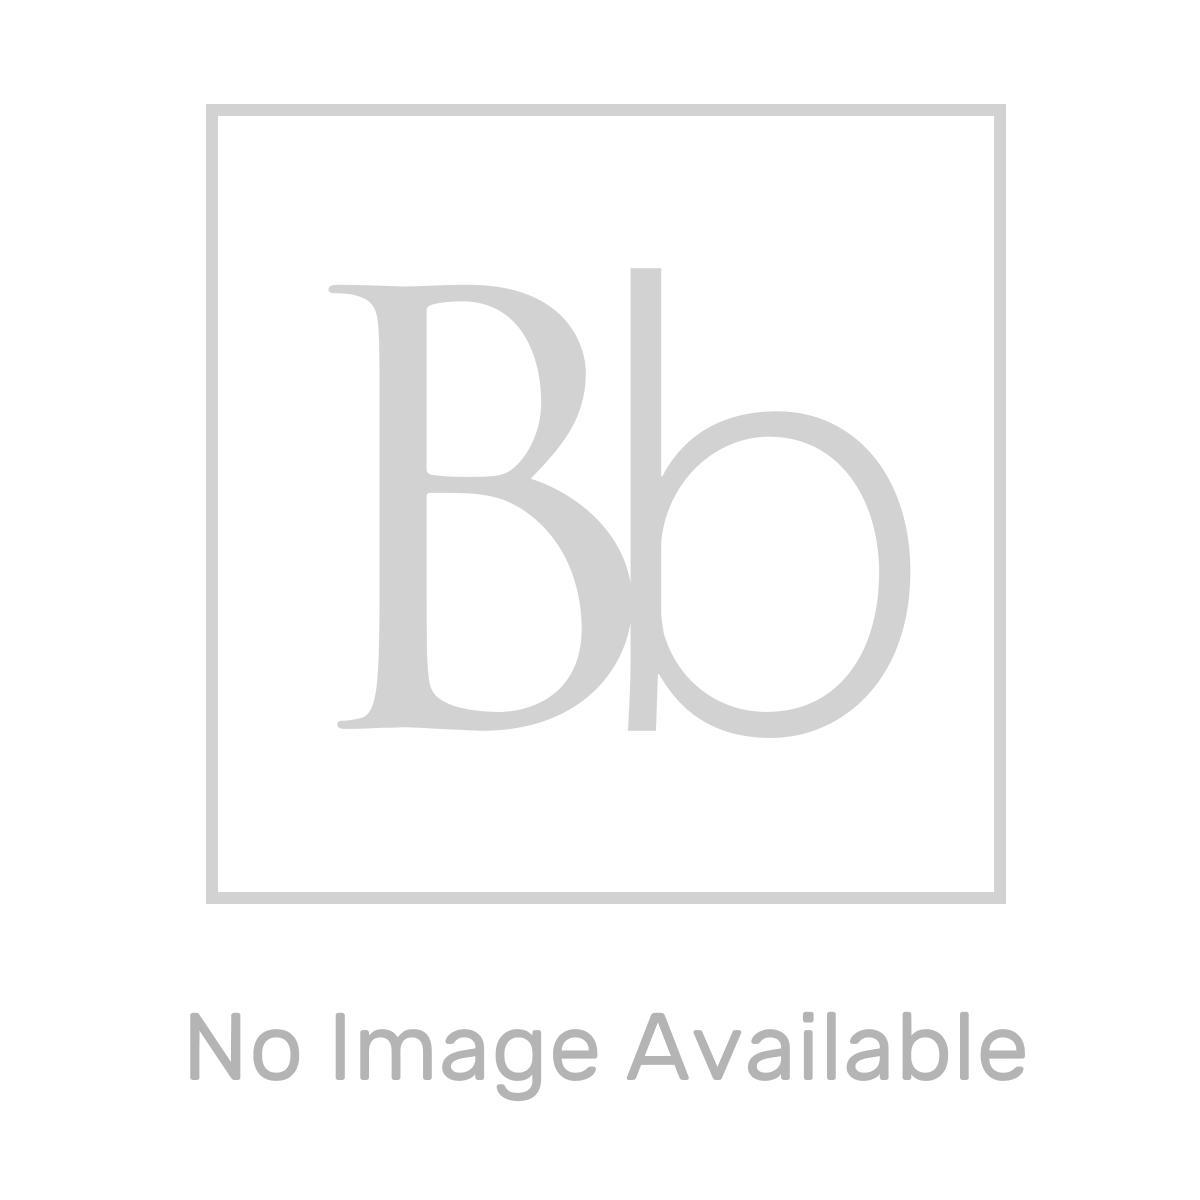 Bali Gloss White Floor Standing Vanity Unit 600mm Dimensions